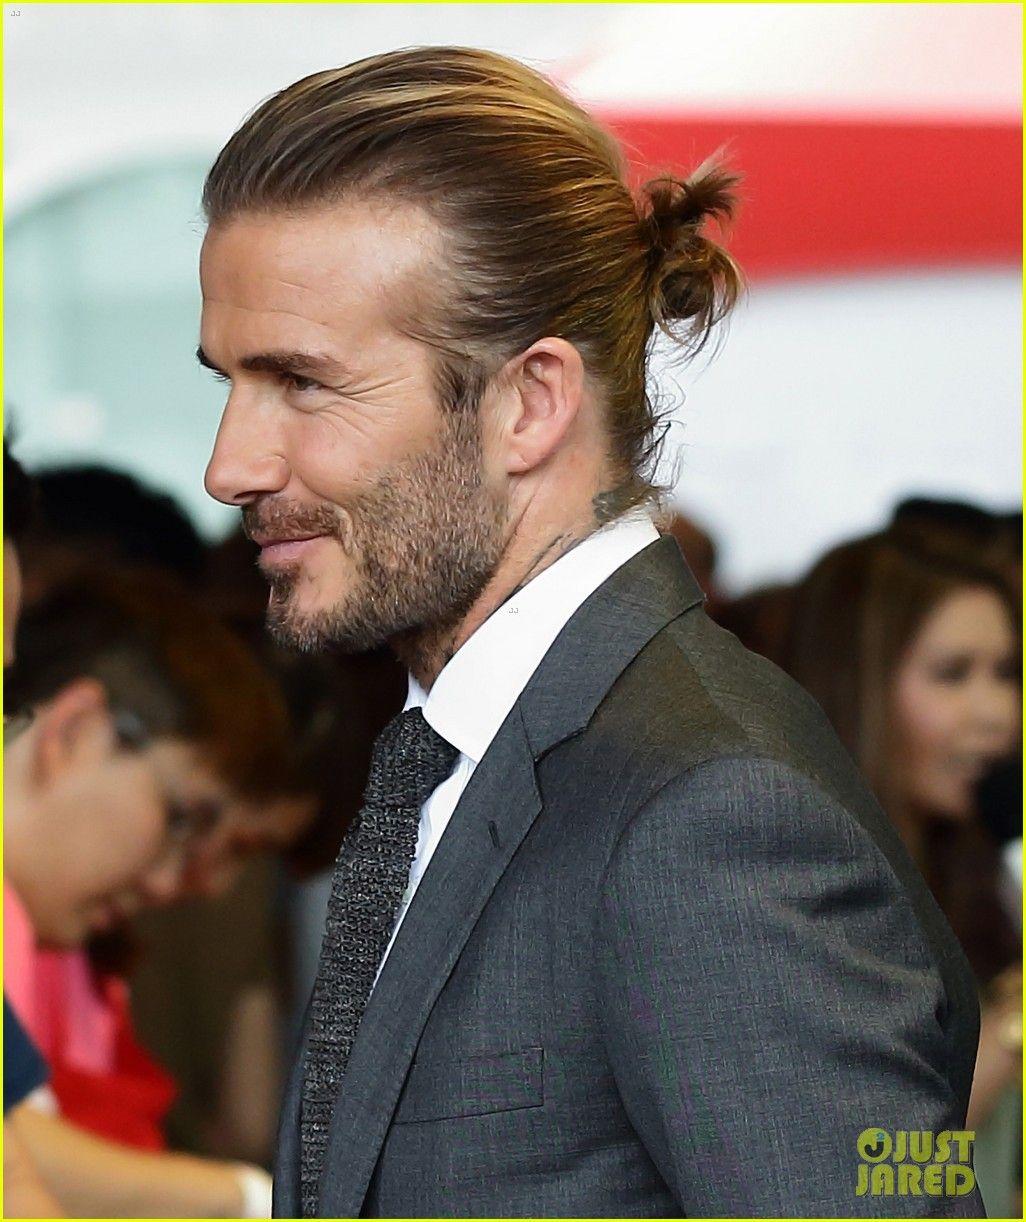 David Beckham Suits Up for a Cookout in Singapore  david beckham